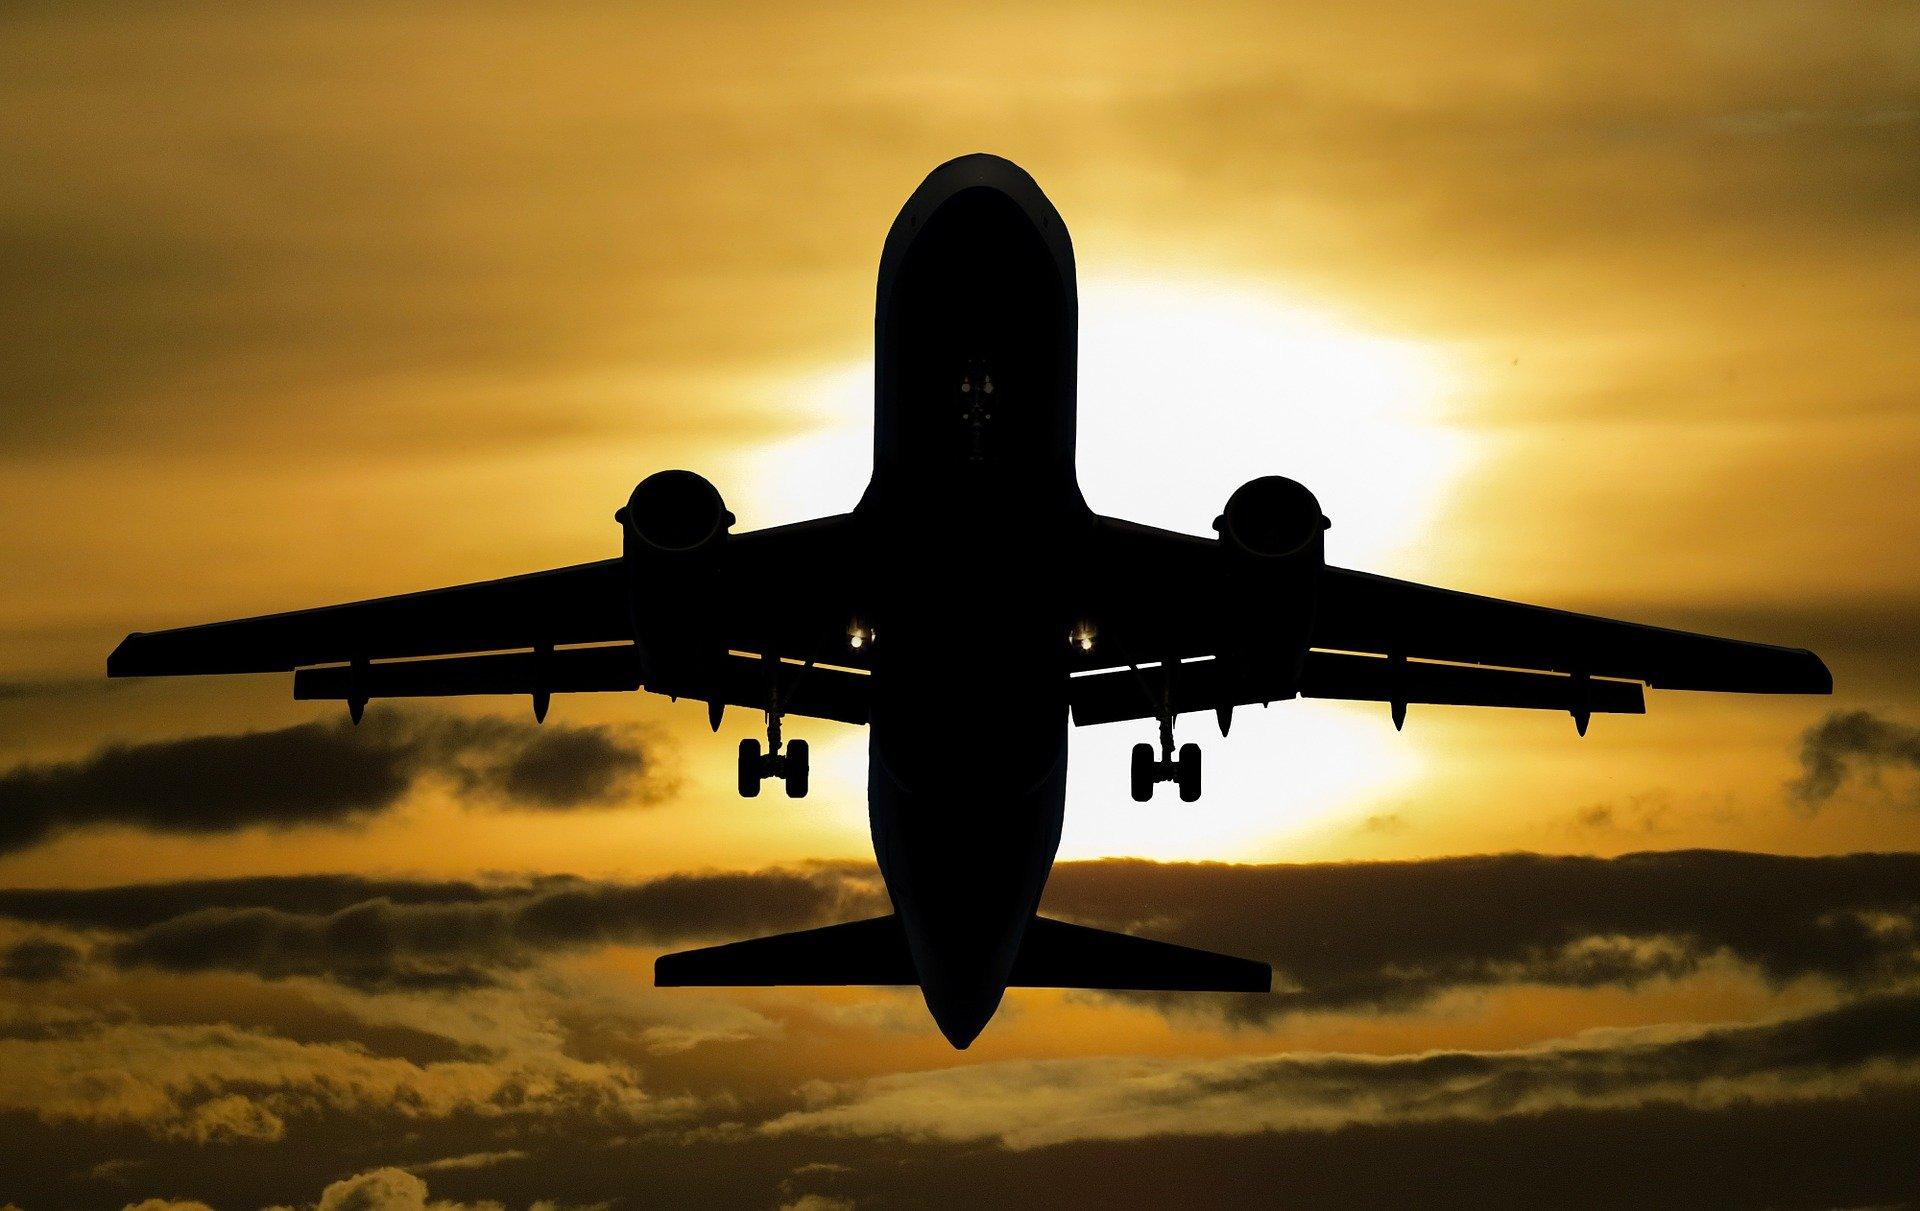 Oferta de vuelos de EU a México se incrementará 204% en verano